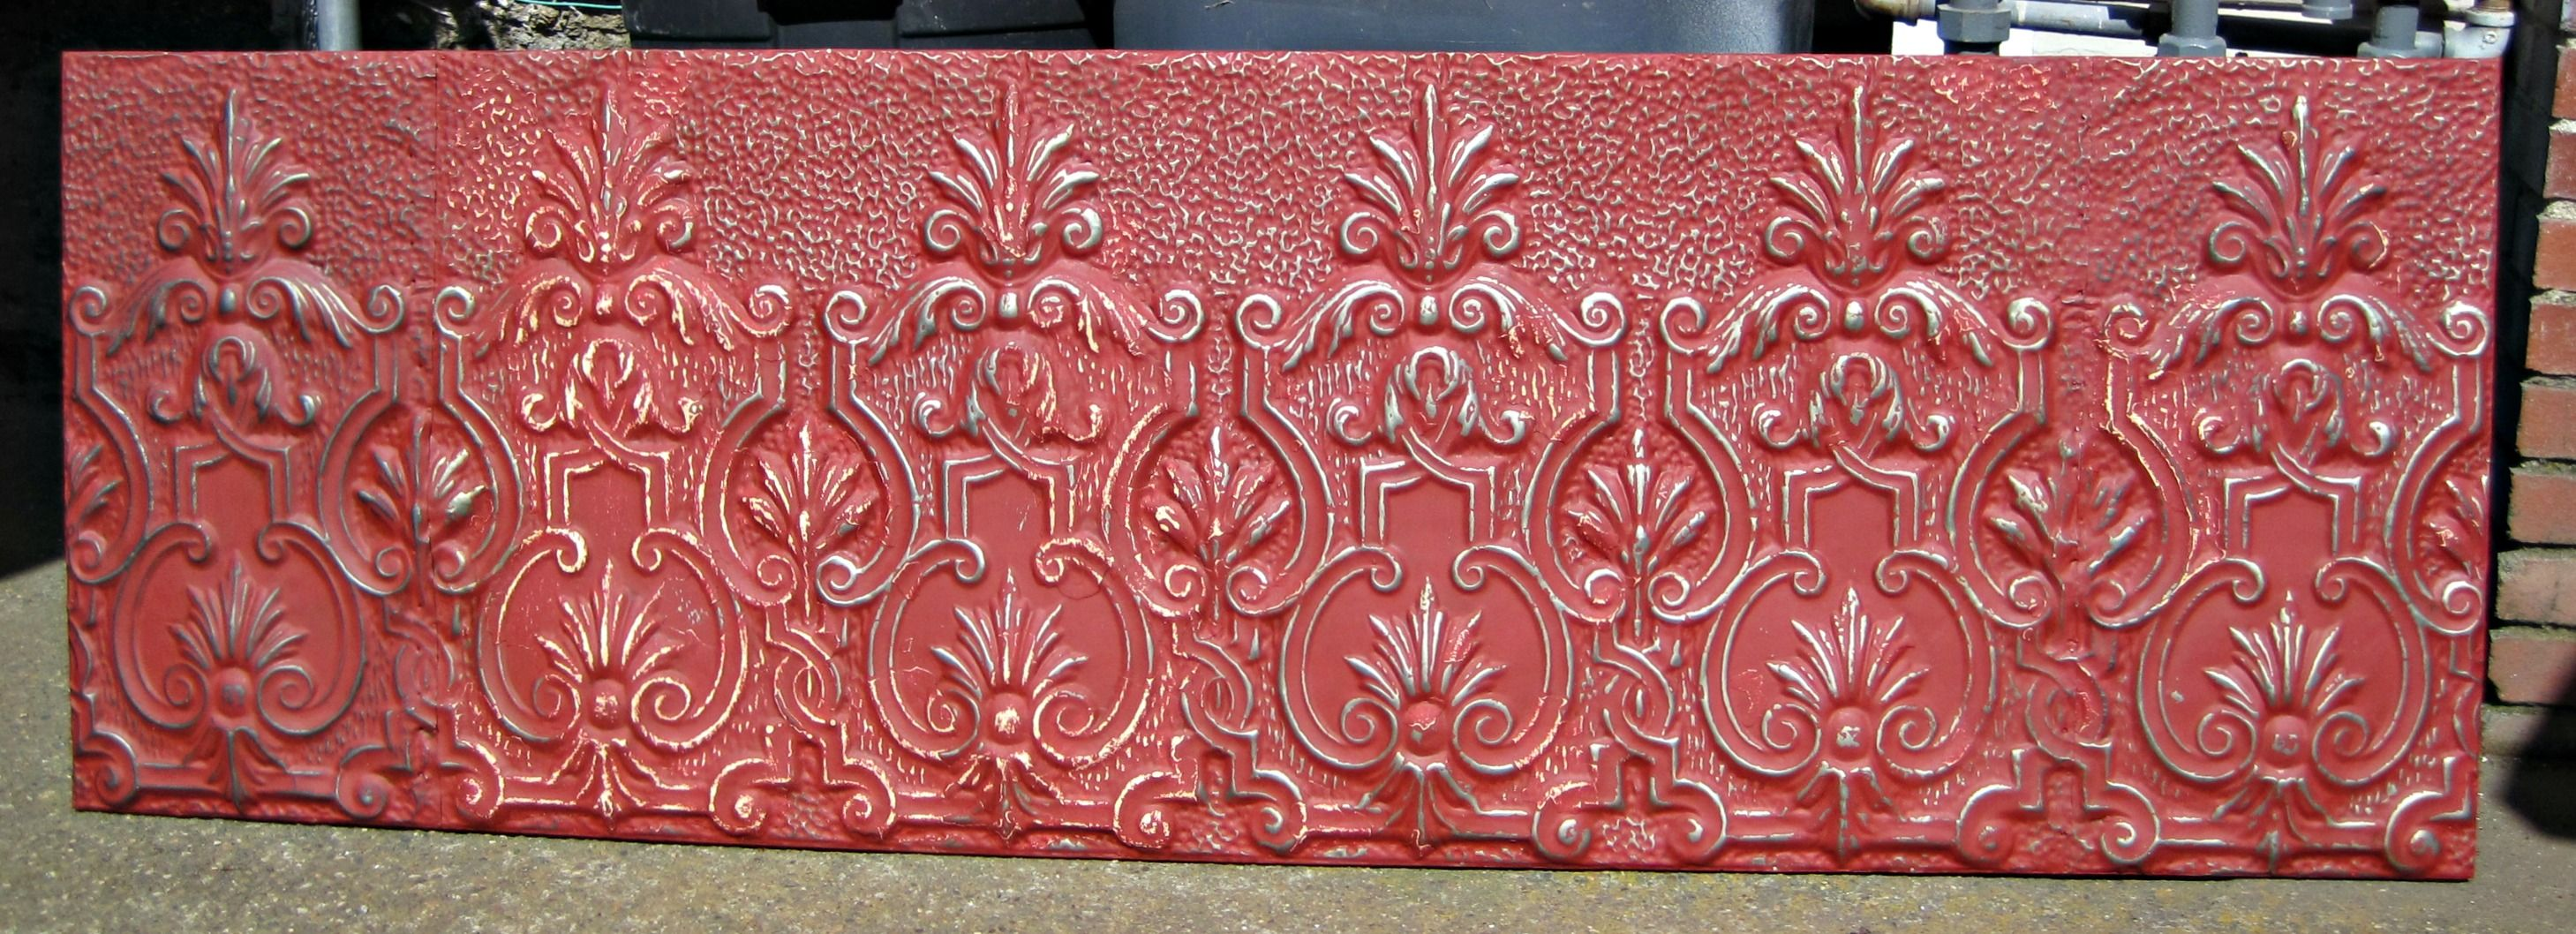 Charming 1 Ceramic Tile Huge 1 Inch Ceramic Tiles Solid 18 Inch Ceramic Tile 2 X 6 White Subway Tile Old 24 X 48 Ceiling Tiles Drop Ceiling Orange2X4 Fiberglass Ceiling Tiles 6\u0027 X 2\u0027 Ceiling Tin Headboard. Tin Salvaged In Northern Wisconsin ..